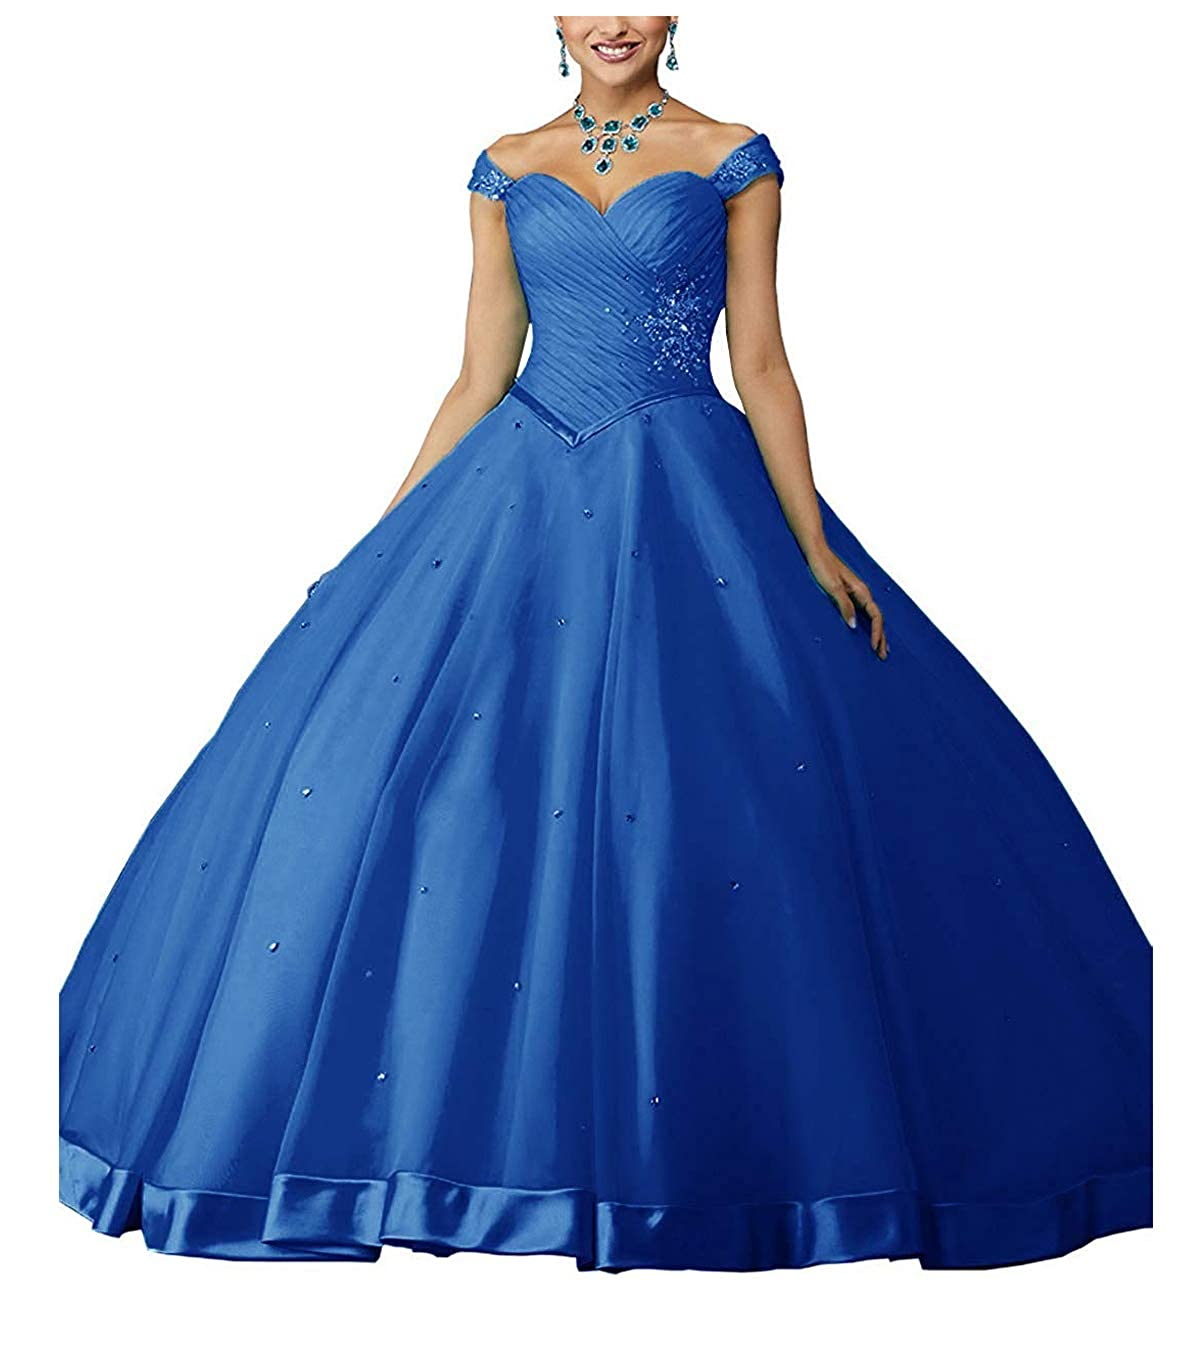 bluee ZLQQ Women's Beaded Ball Gown Lace Applique Sweet 16 Detachable Quinceanera Dress